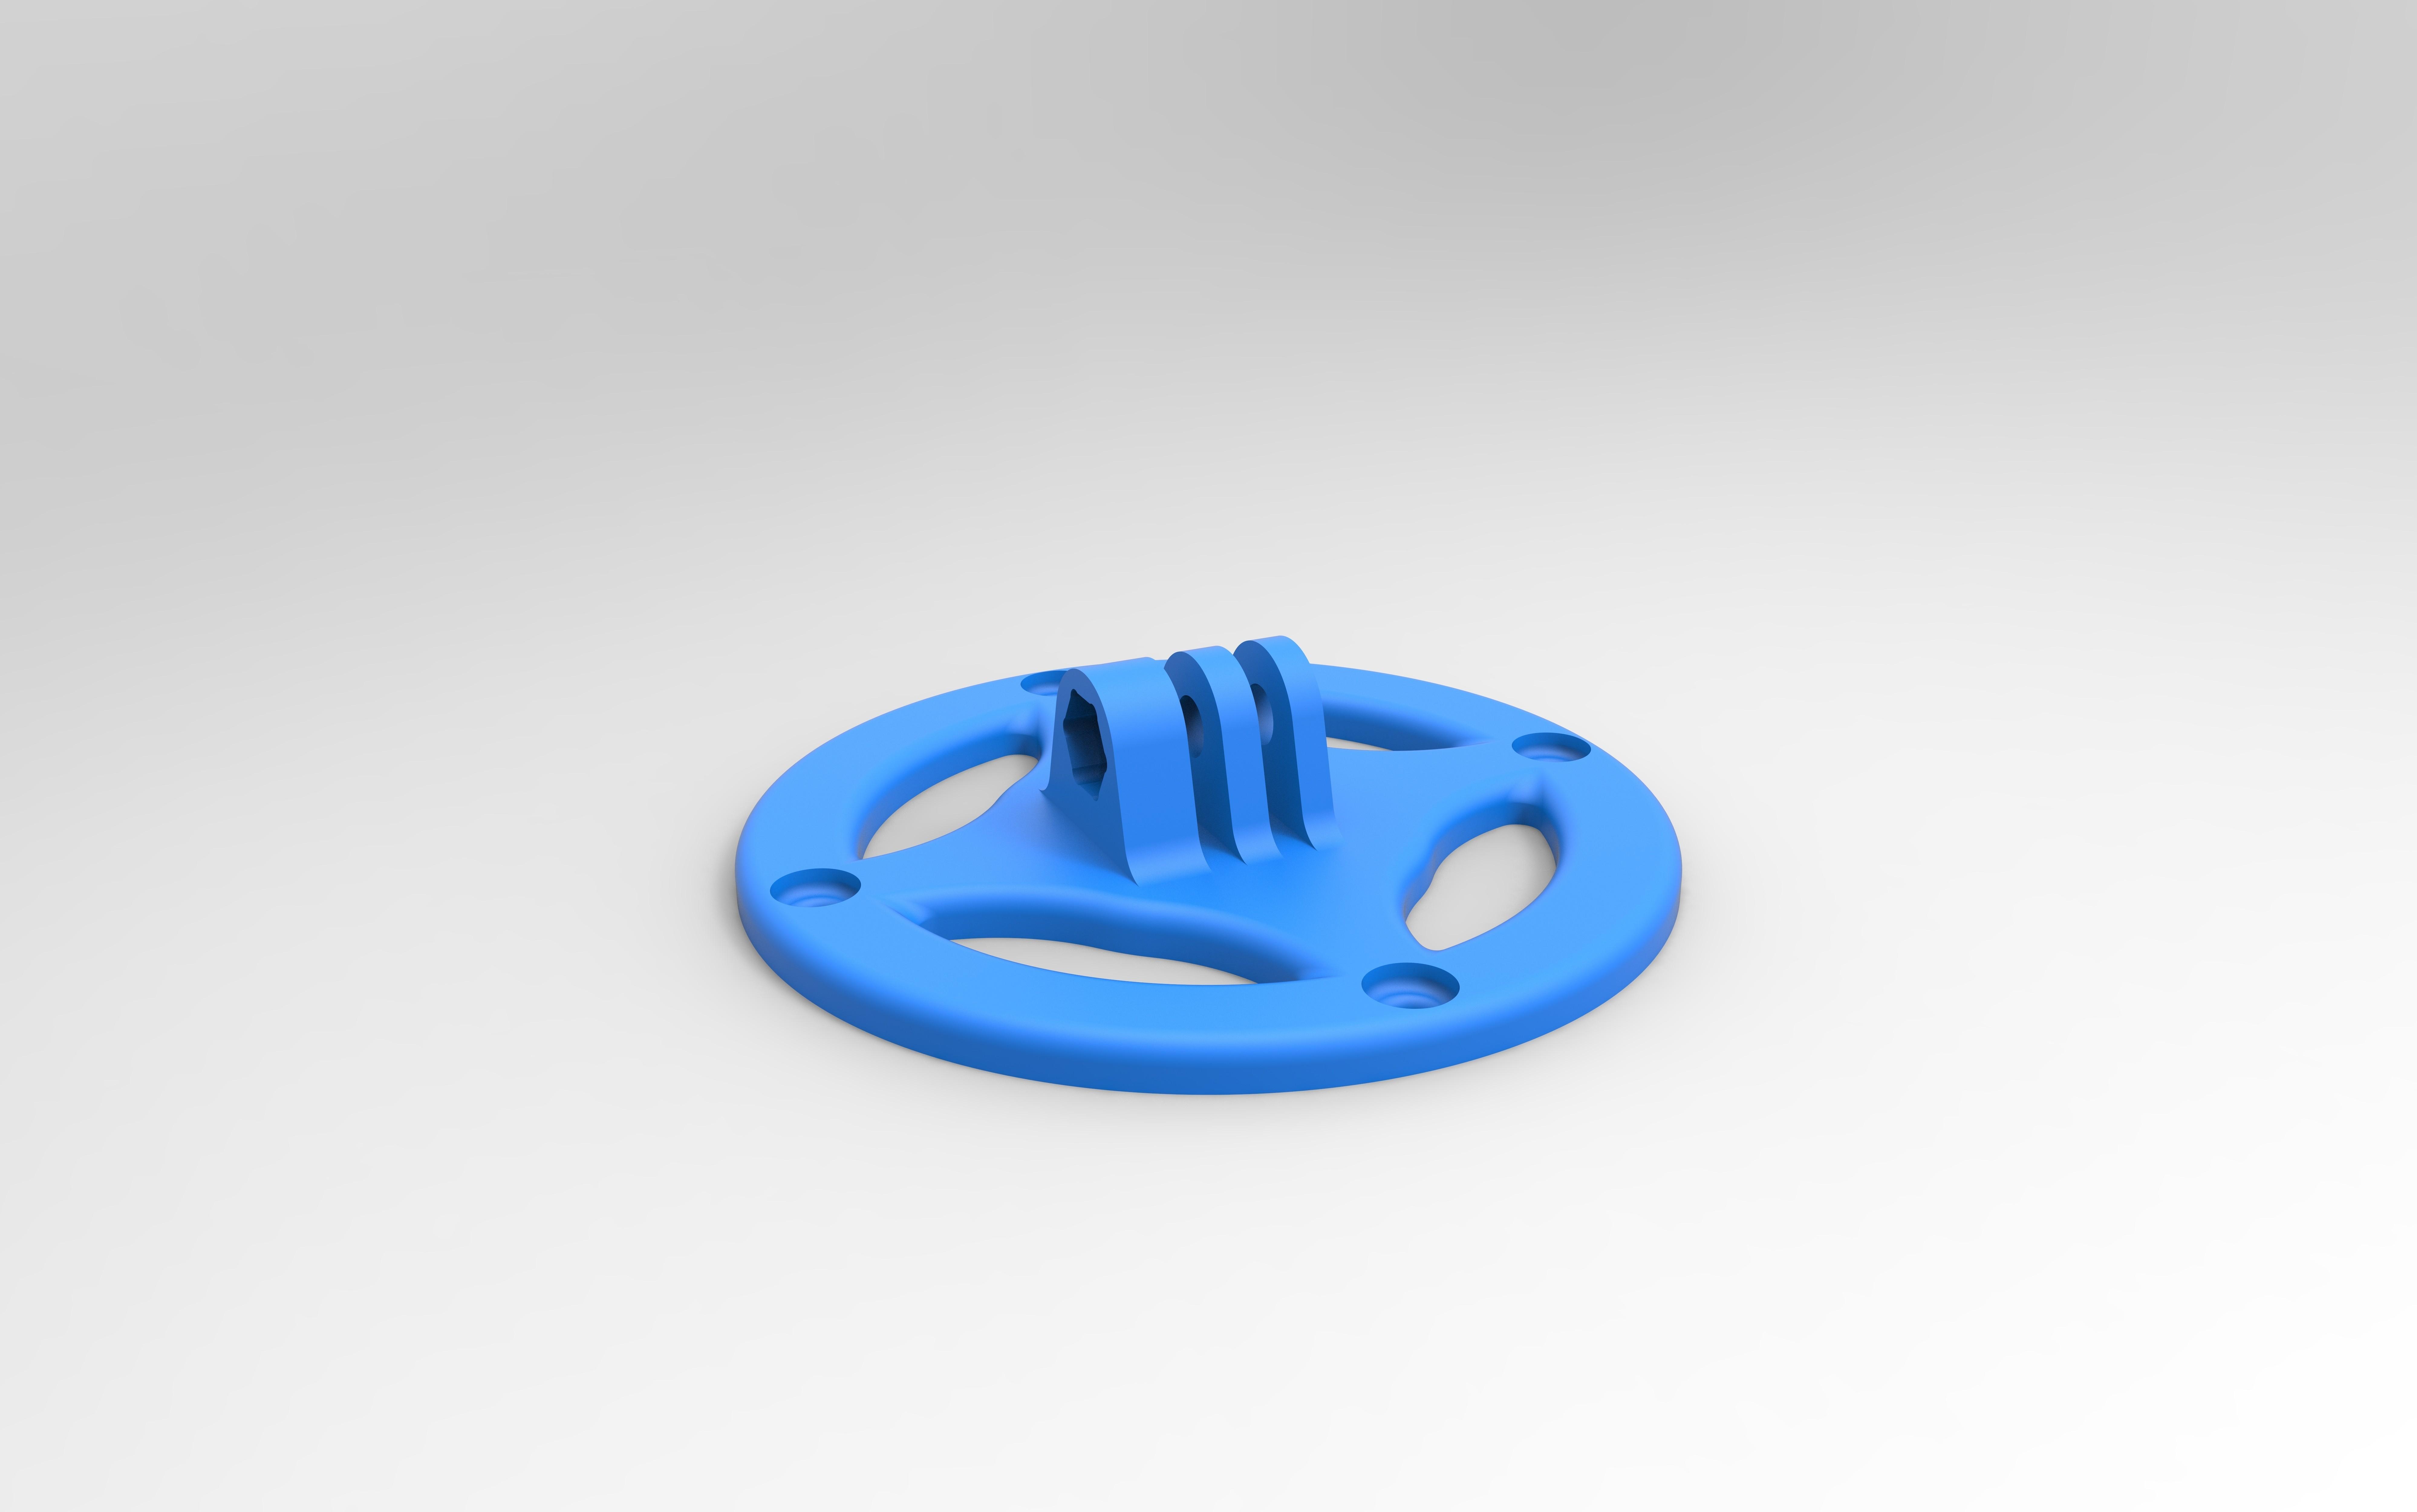 rendu gopro bleu.jpg Download free STL file gopro fixation • Design to 3D print, GuilhemPerroud